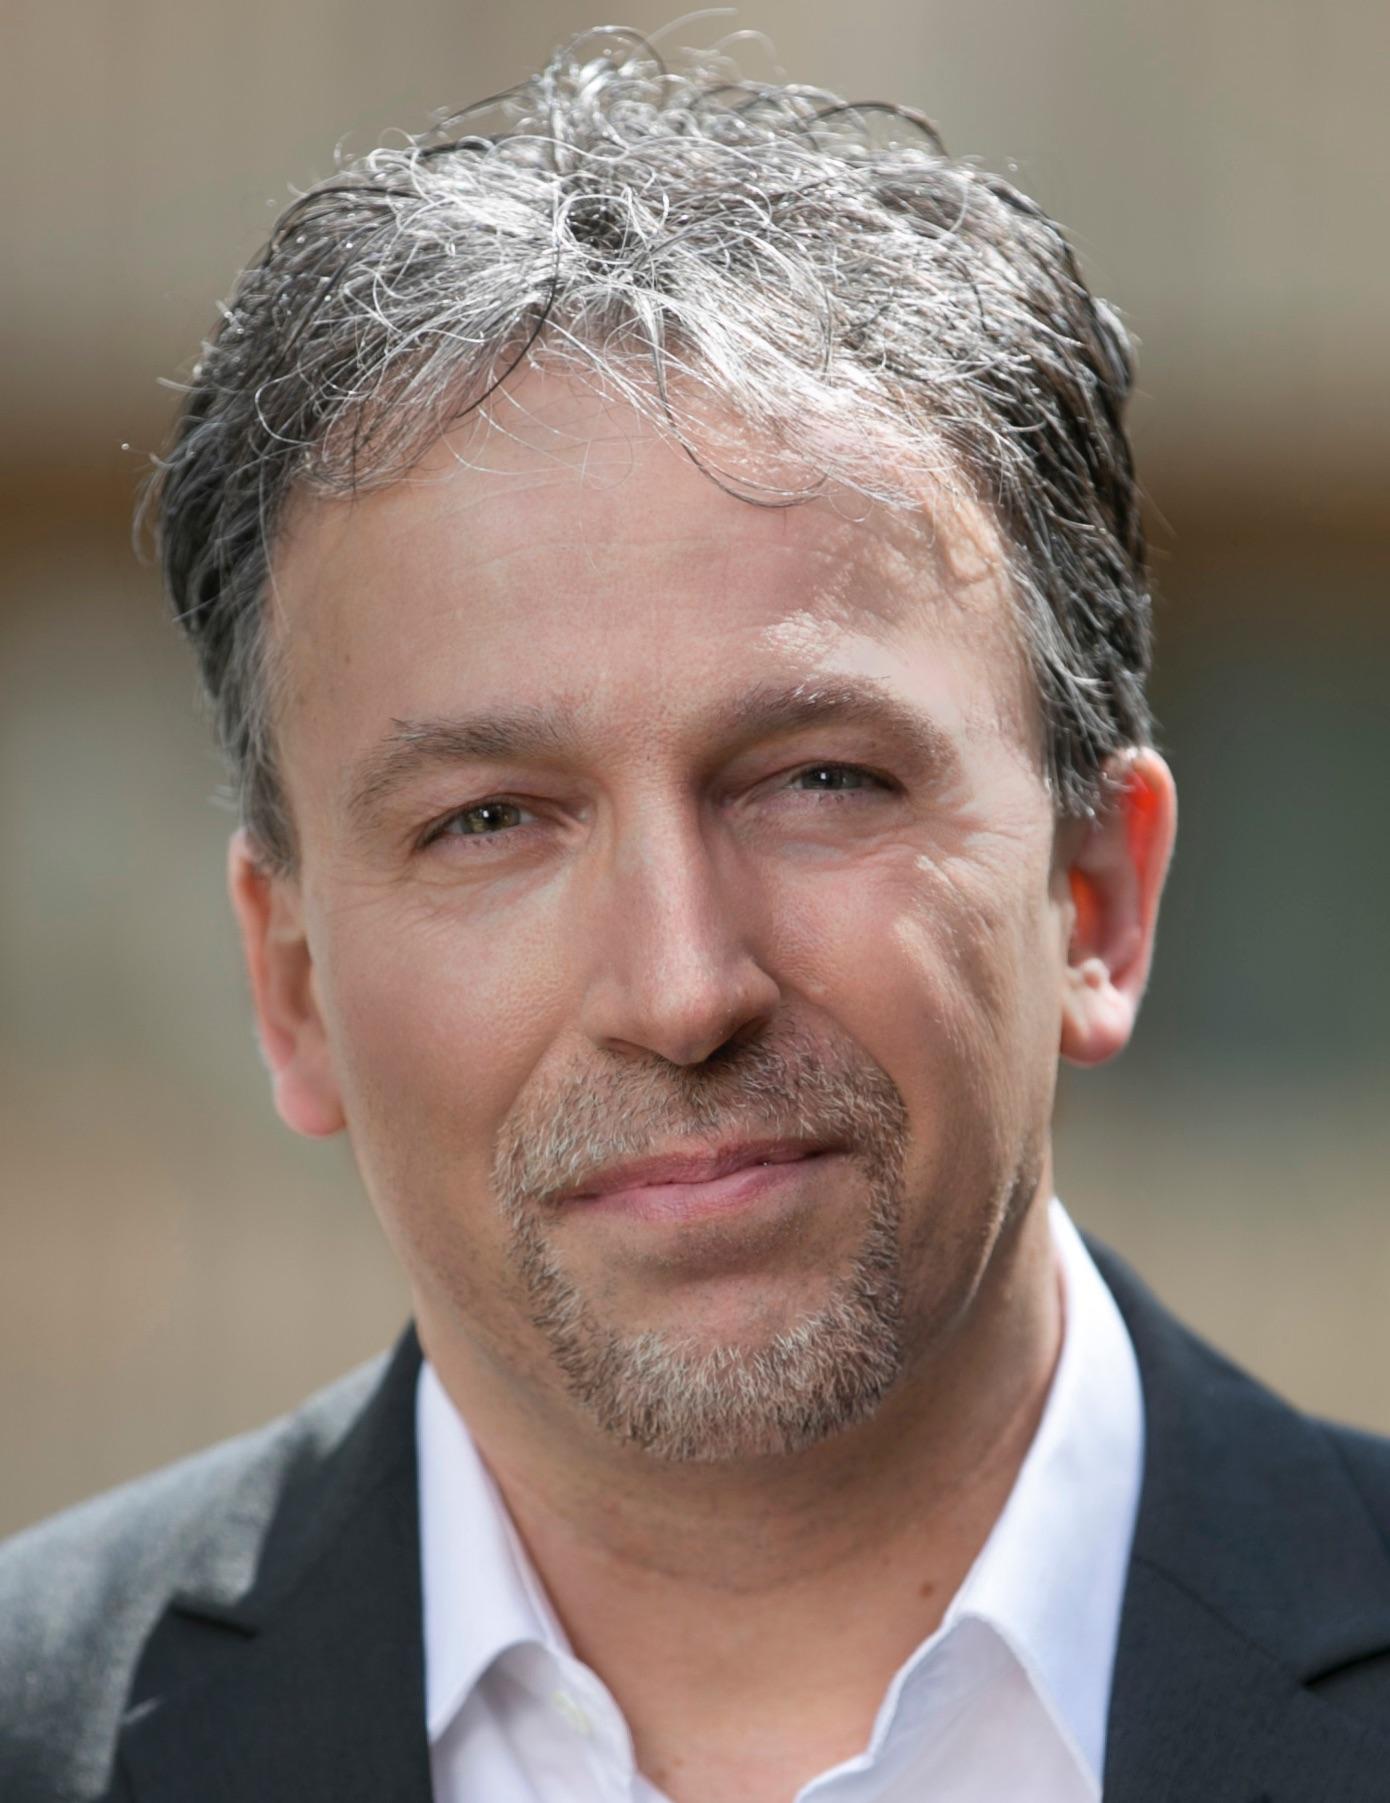 Pastoren, Hauptpastor Bernd C. Trümper